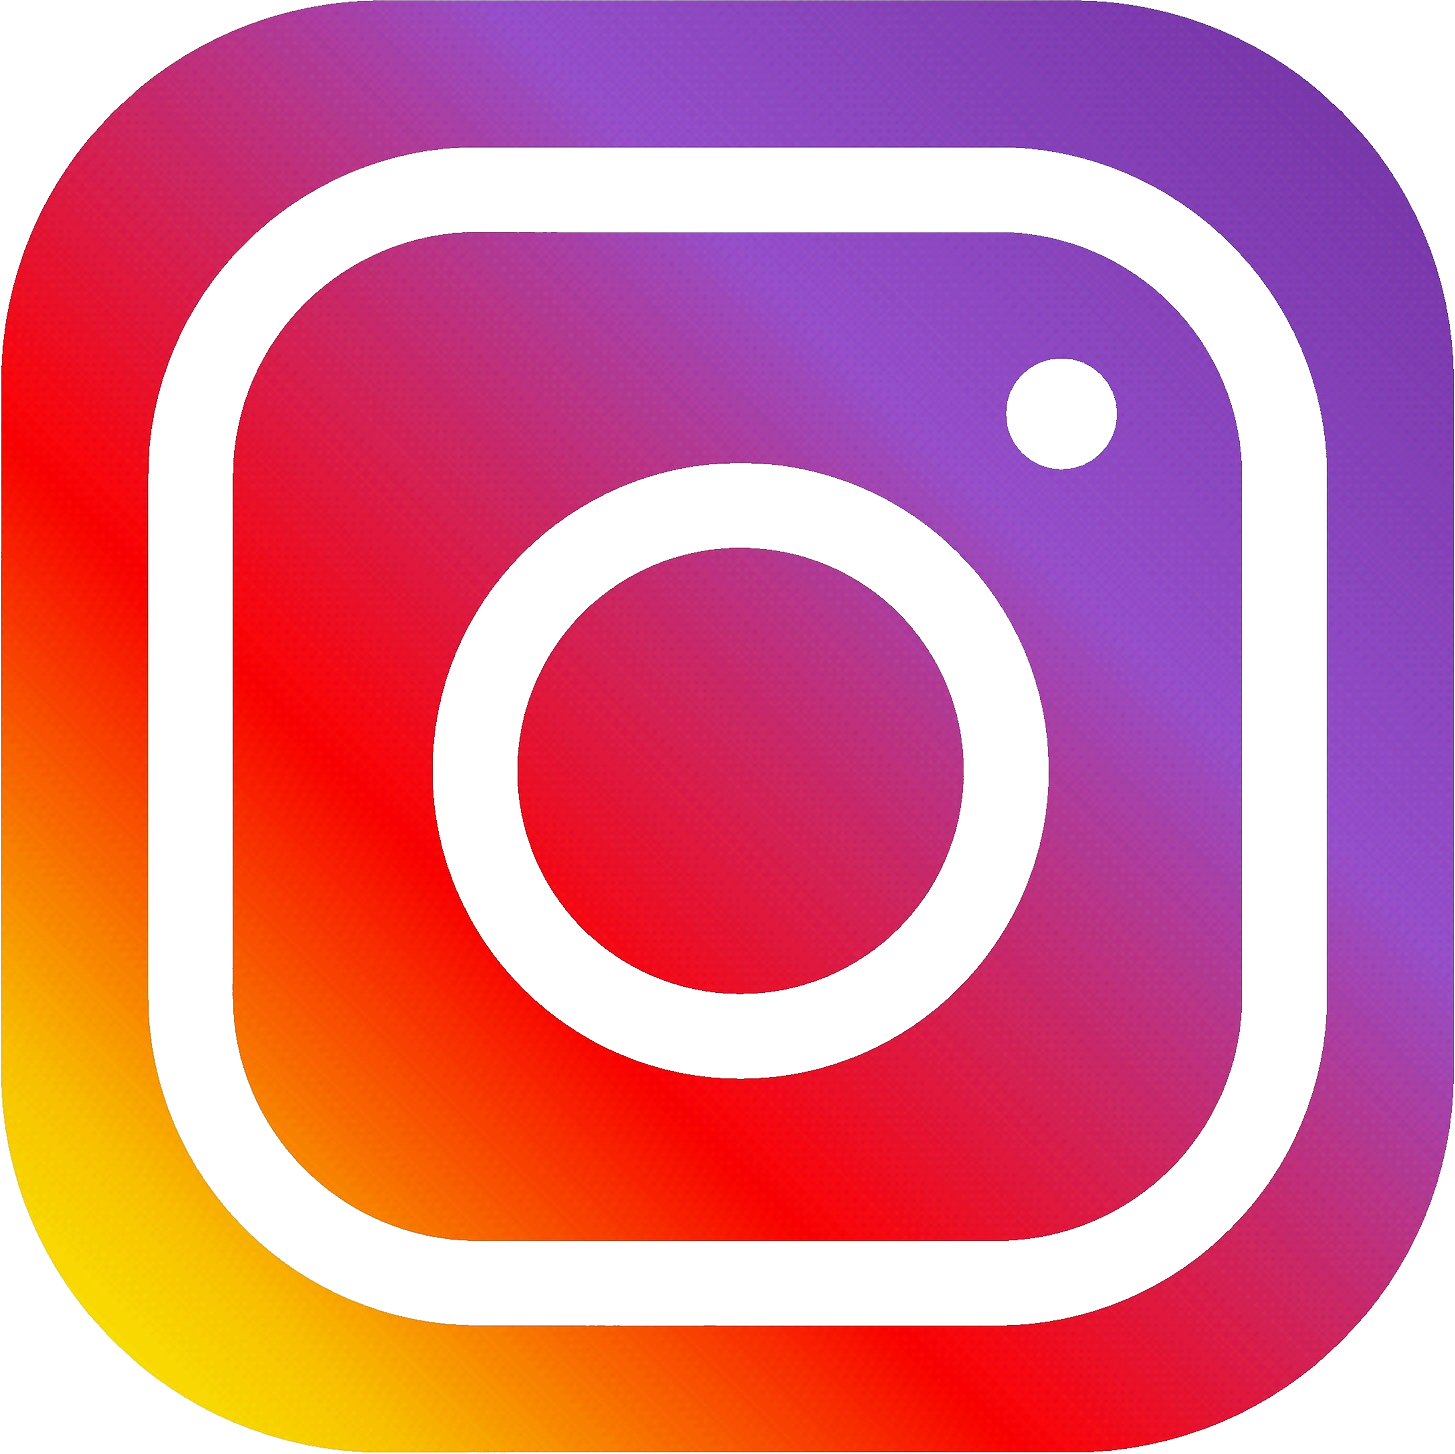 https://www.instagram.com/ampcharge/